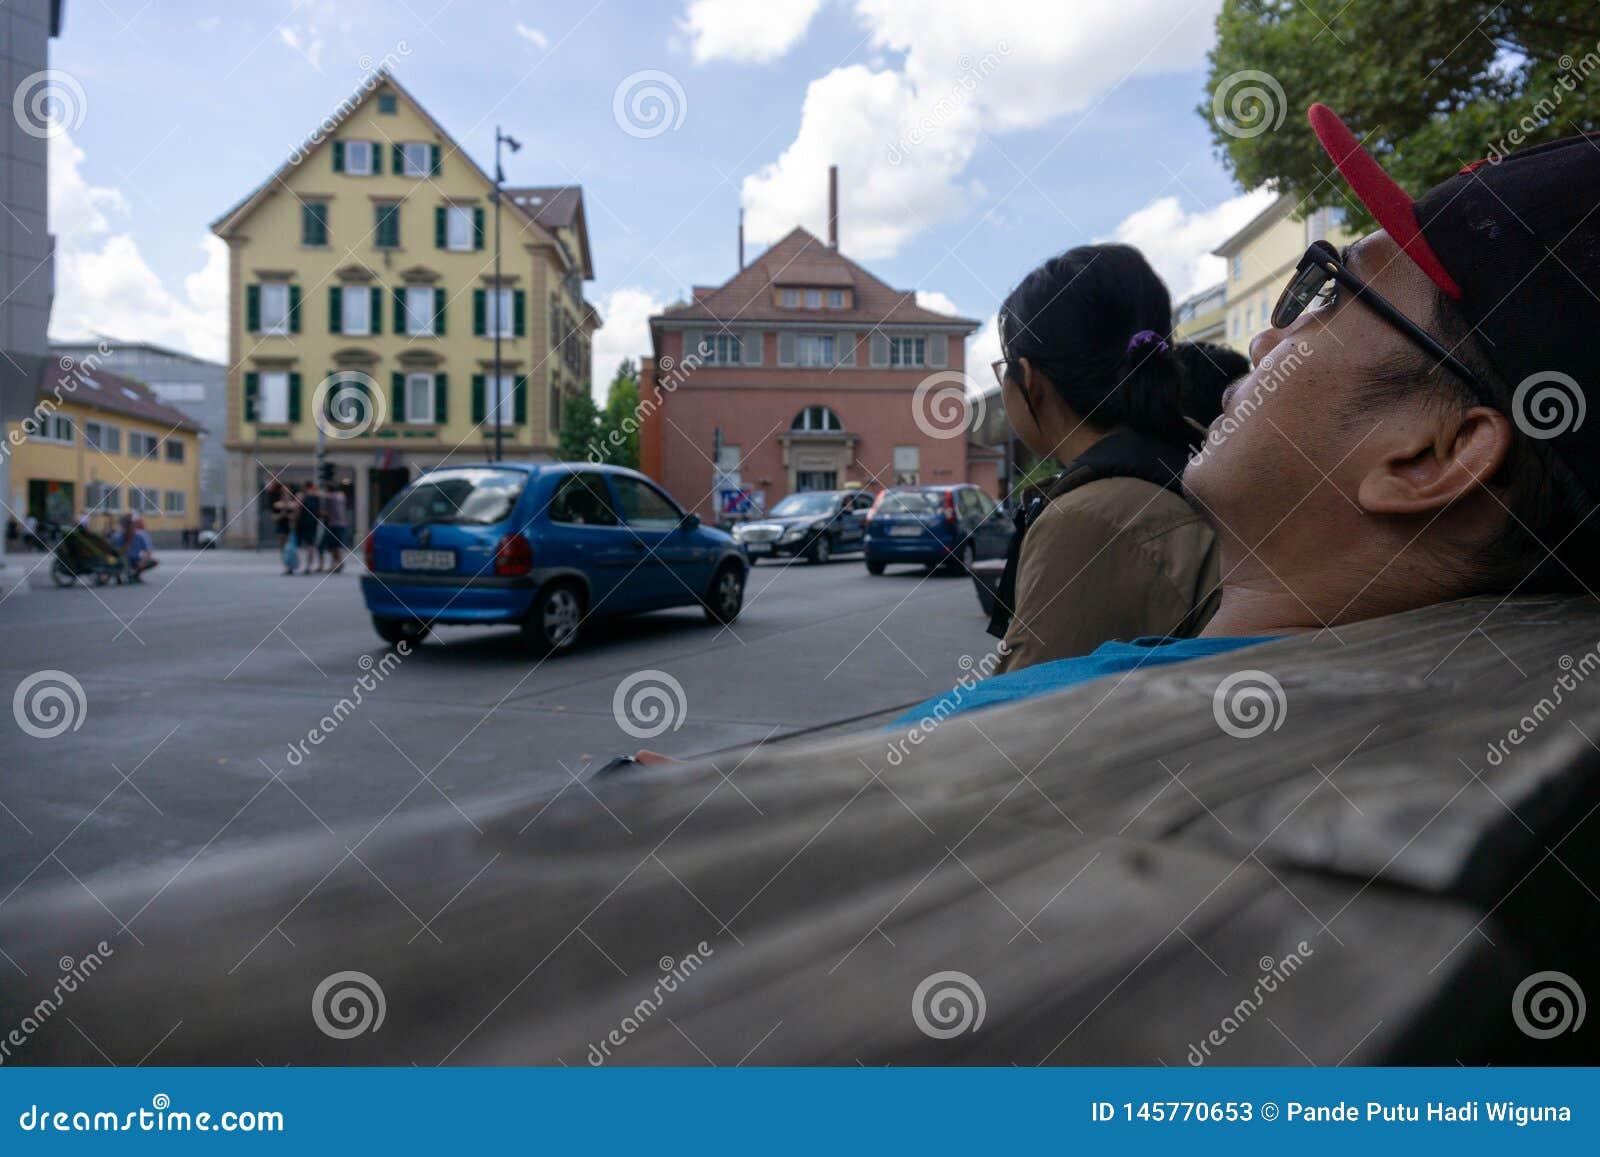 TUBINGEN/GERMANY-JULY 29 2018年:在蒂宾根附近的街道大气 步行空间是非常宽的,与经典式大厦